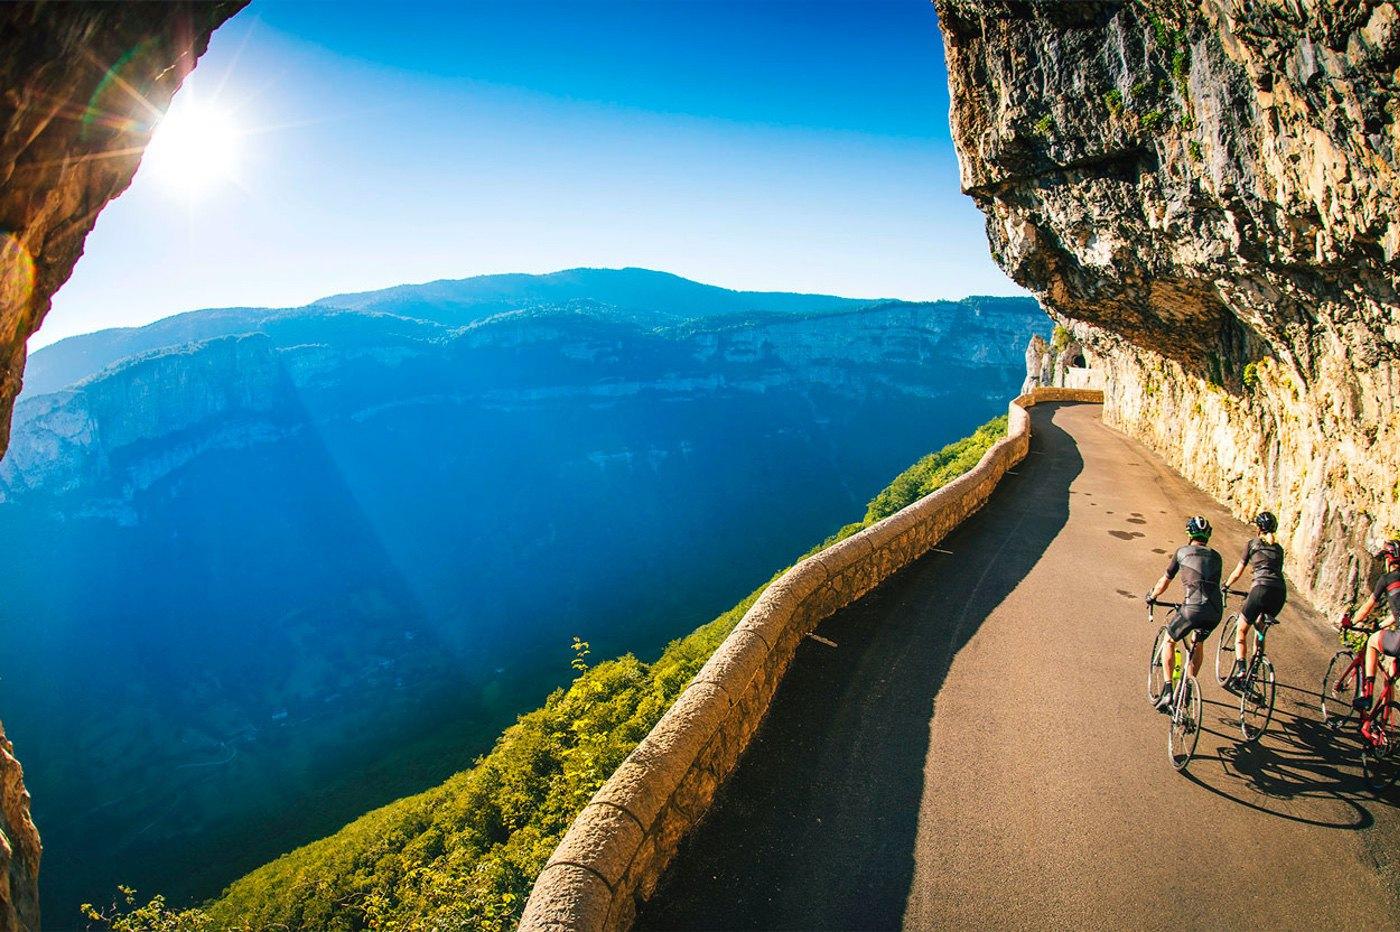 Cicleon, distribución de marcas de accesorios para ciclismo